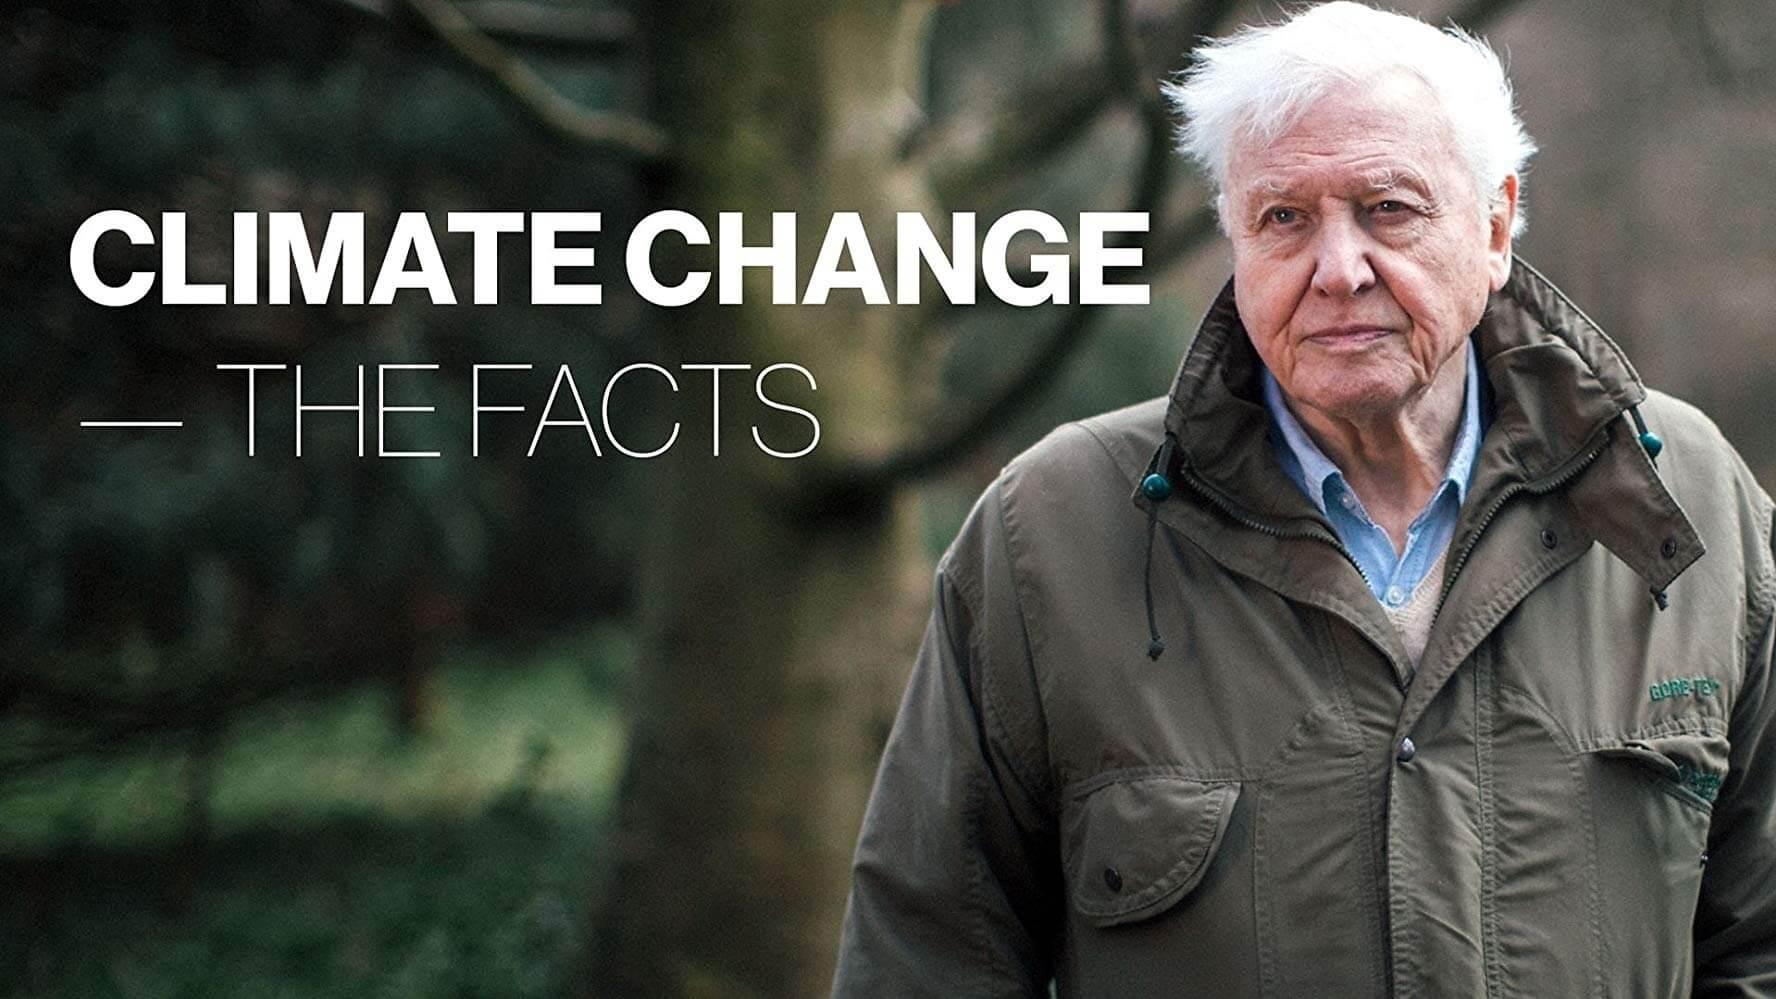 This David Attenborough Documentary Will Make You An Environmentalist